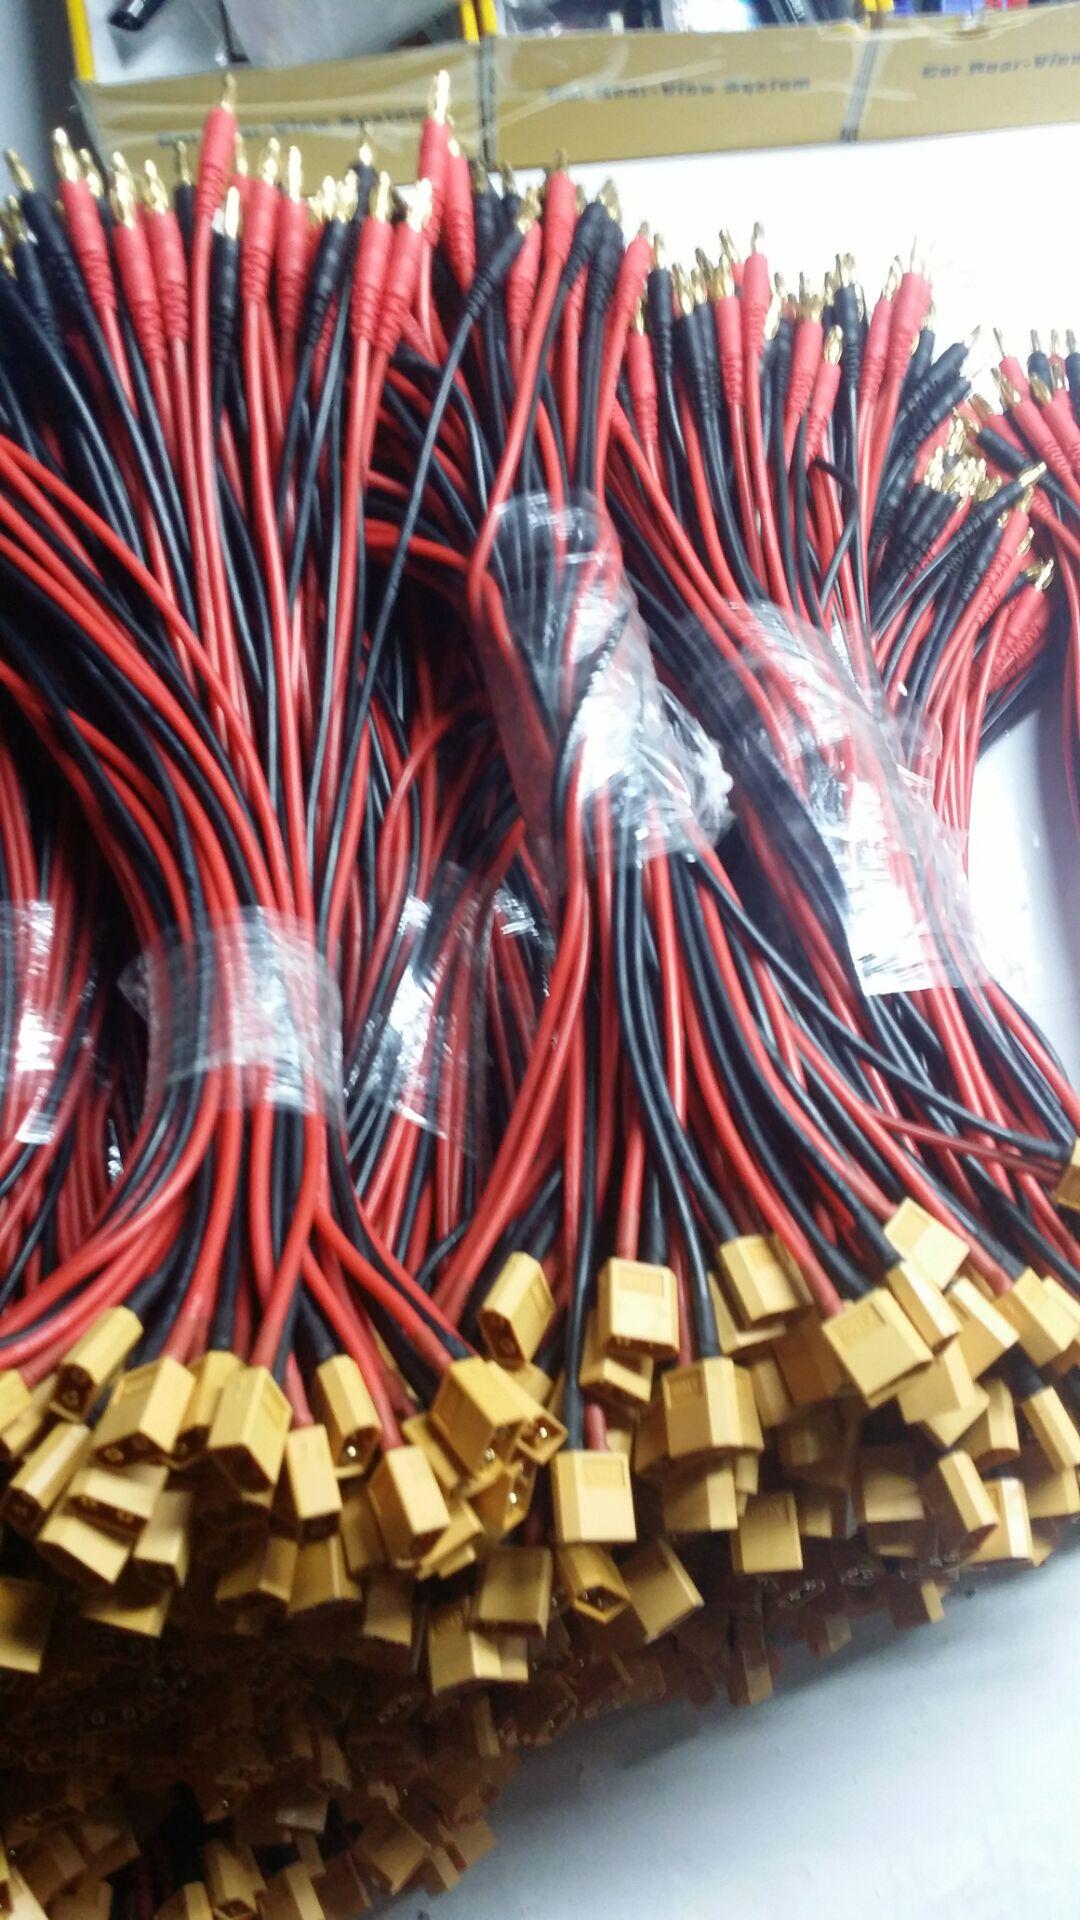 RC battery charger cable EC2 EC3 EC5 Deans Tamiya MPX XT30 XT60 XT90 XT150 Traxxas HXT Futaba to 4mm banana plug adapter cable